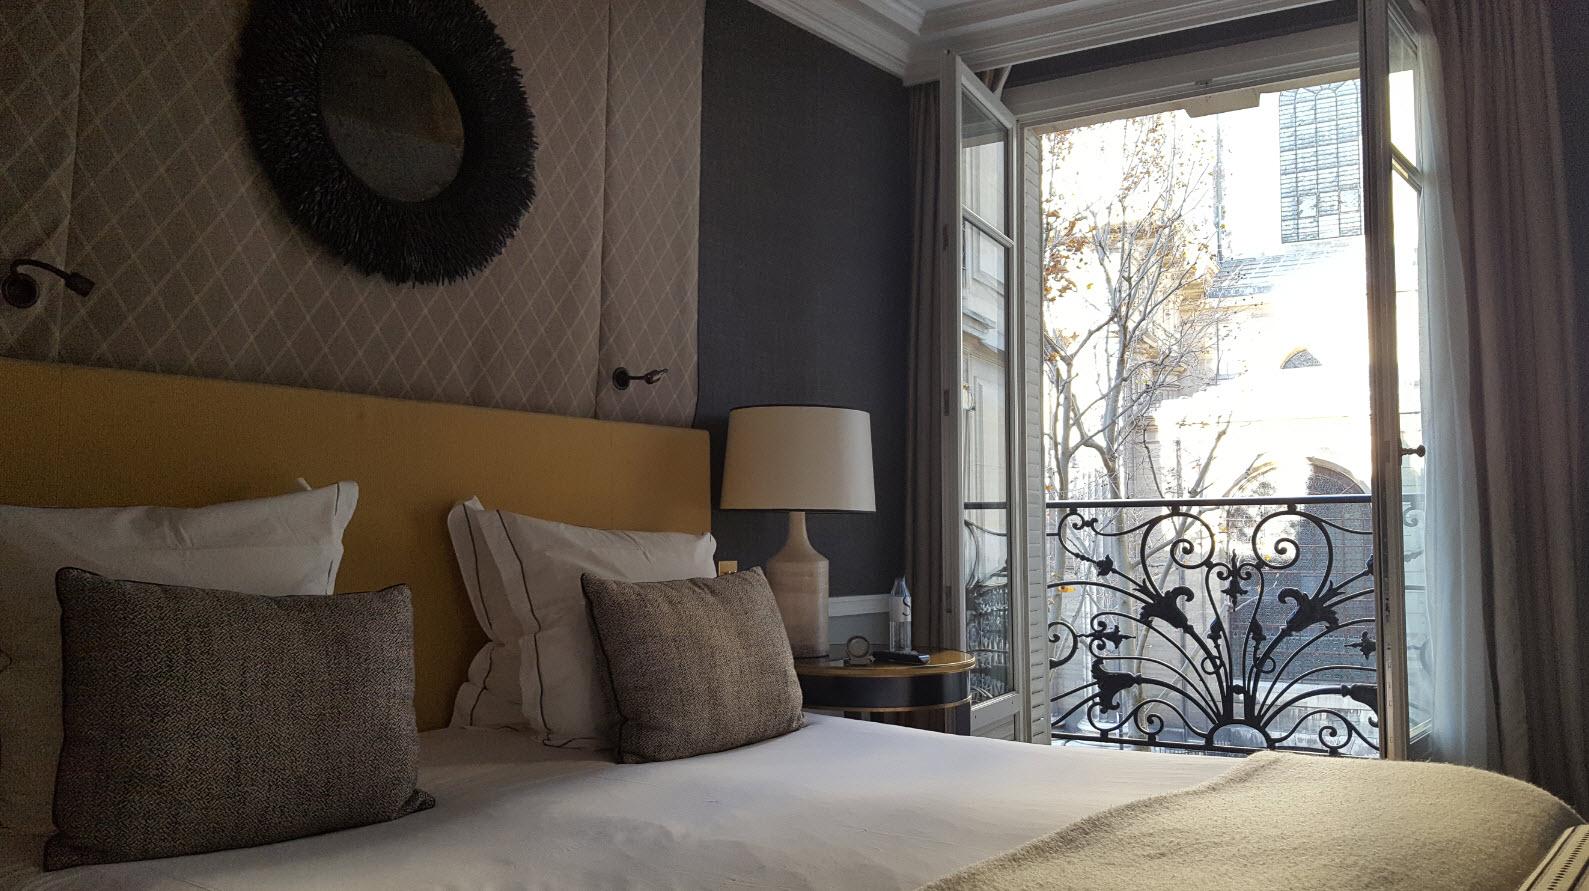 Hotel Saint-Germain-des-Pres